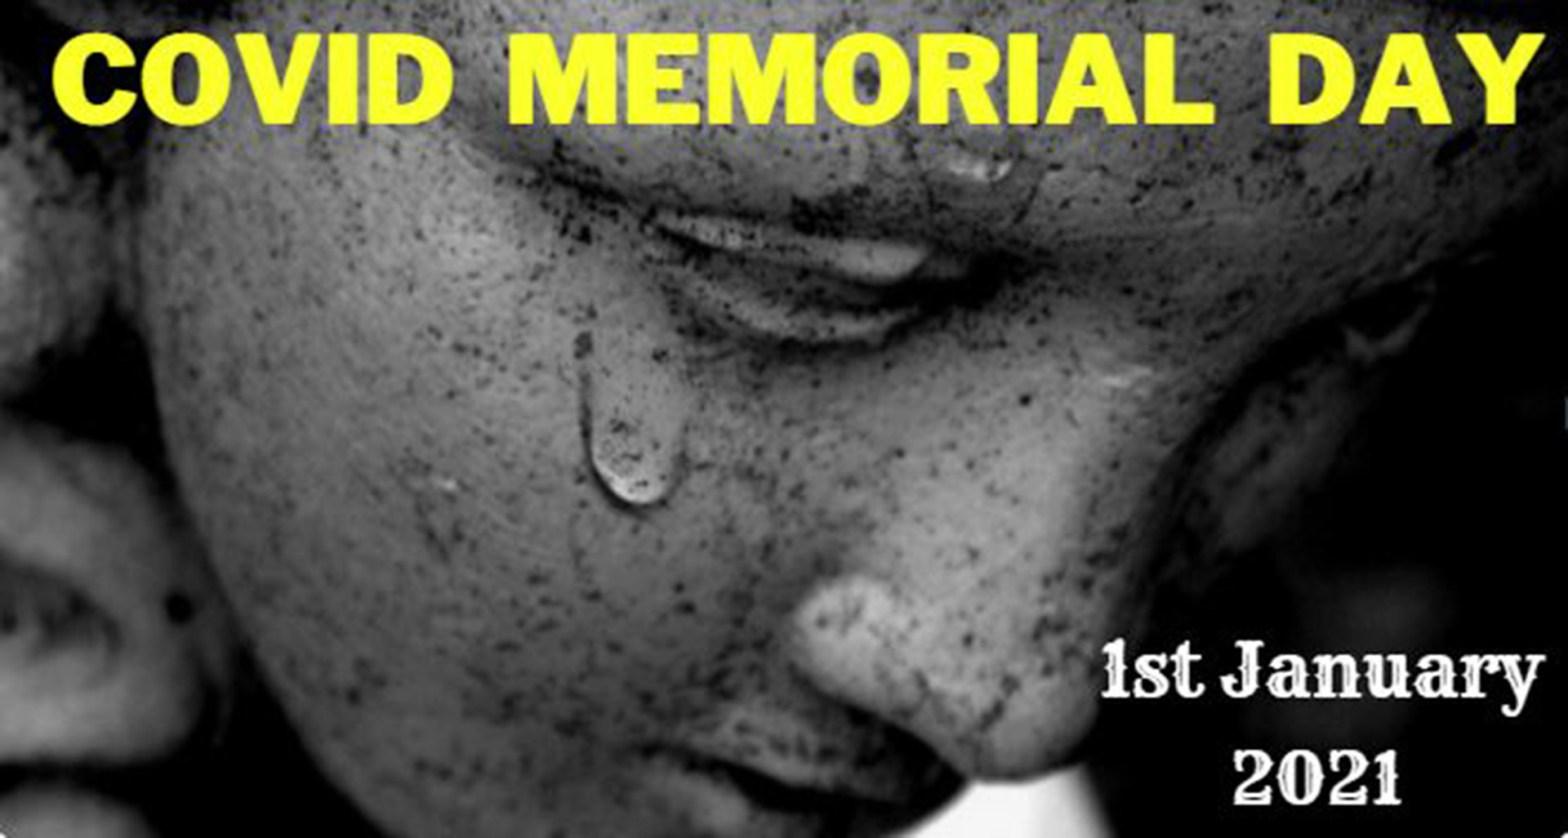 Covid memorial Day 1st jan 2021